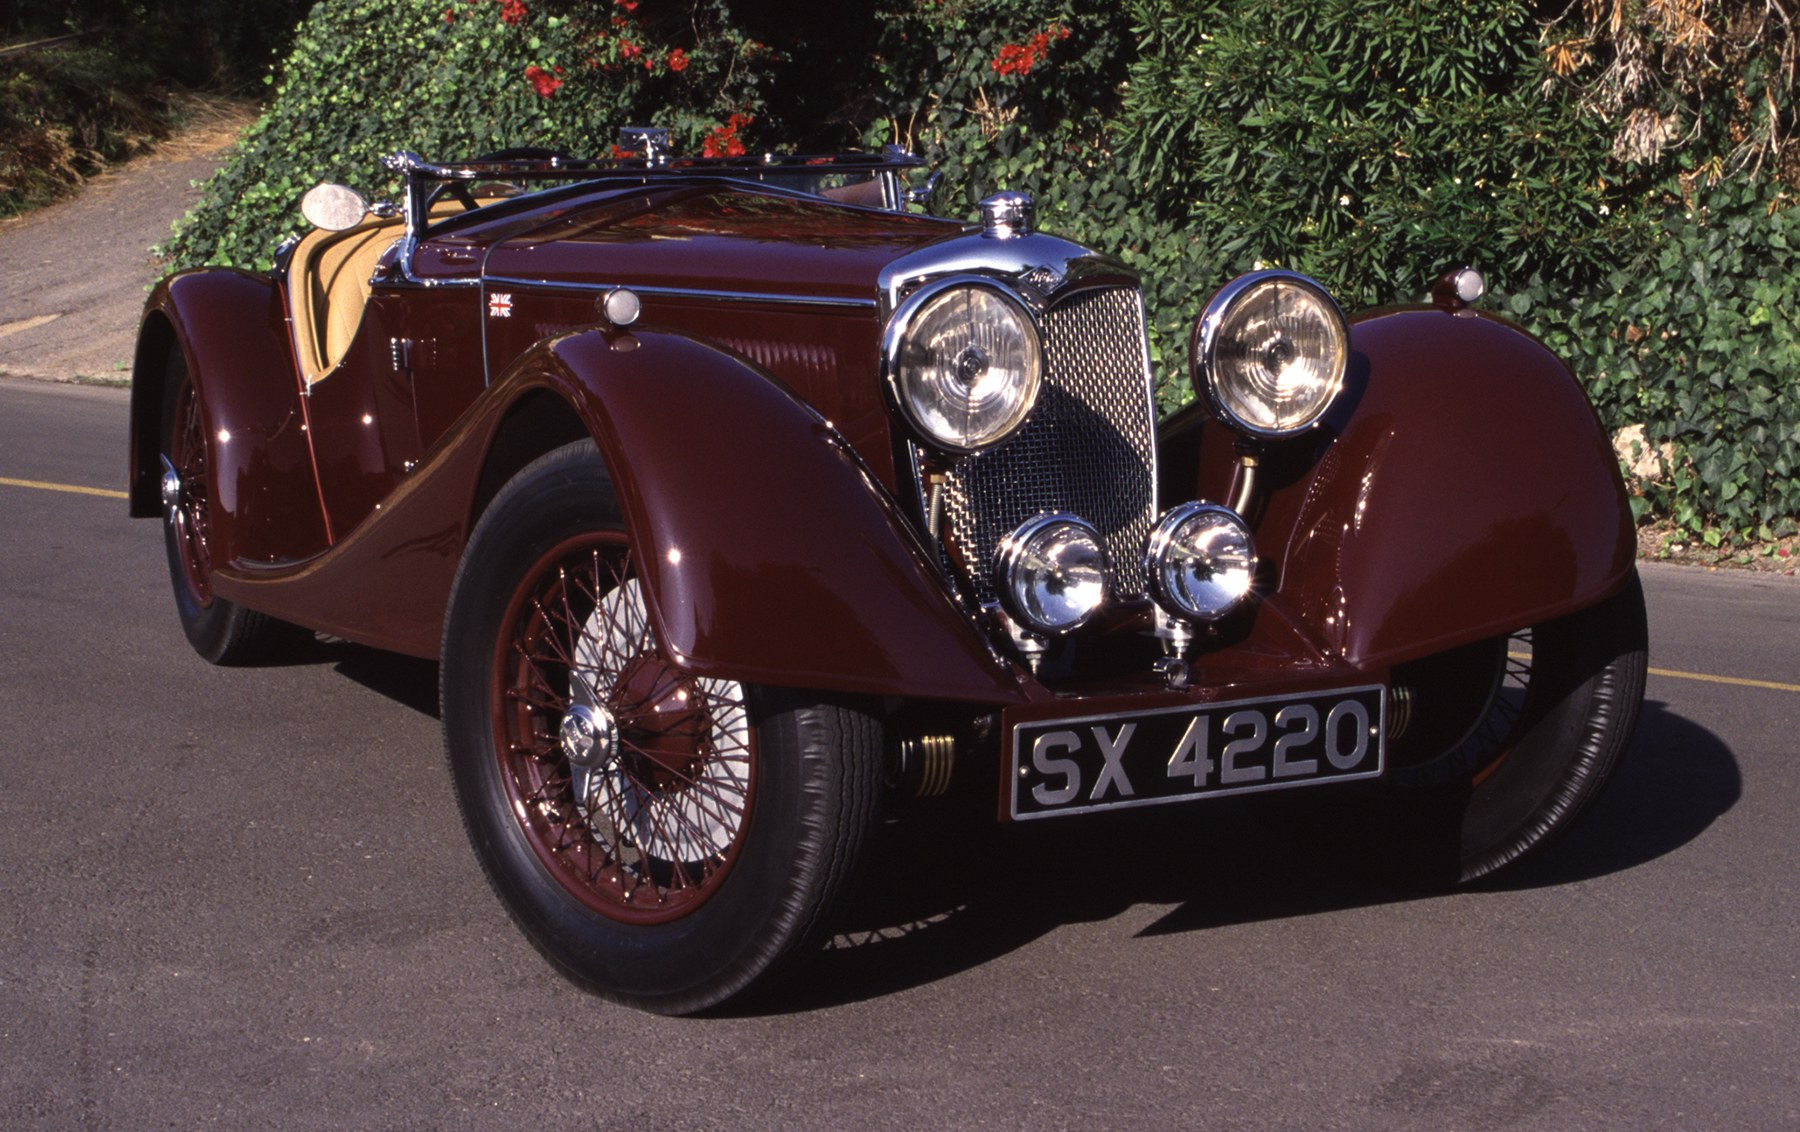 1935 Riley Sprite